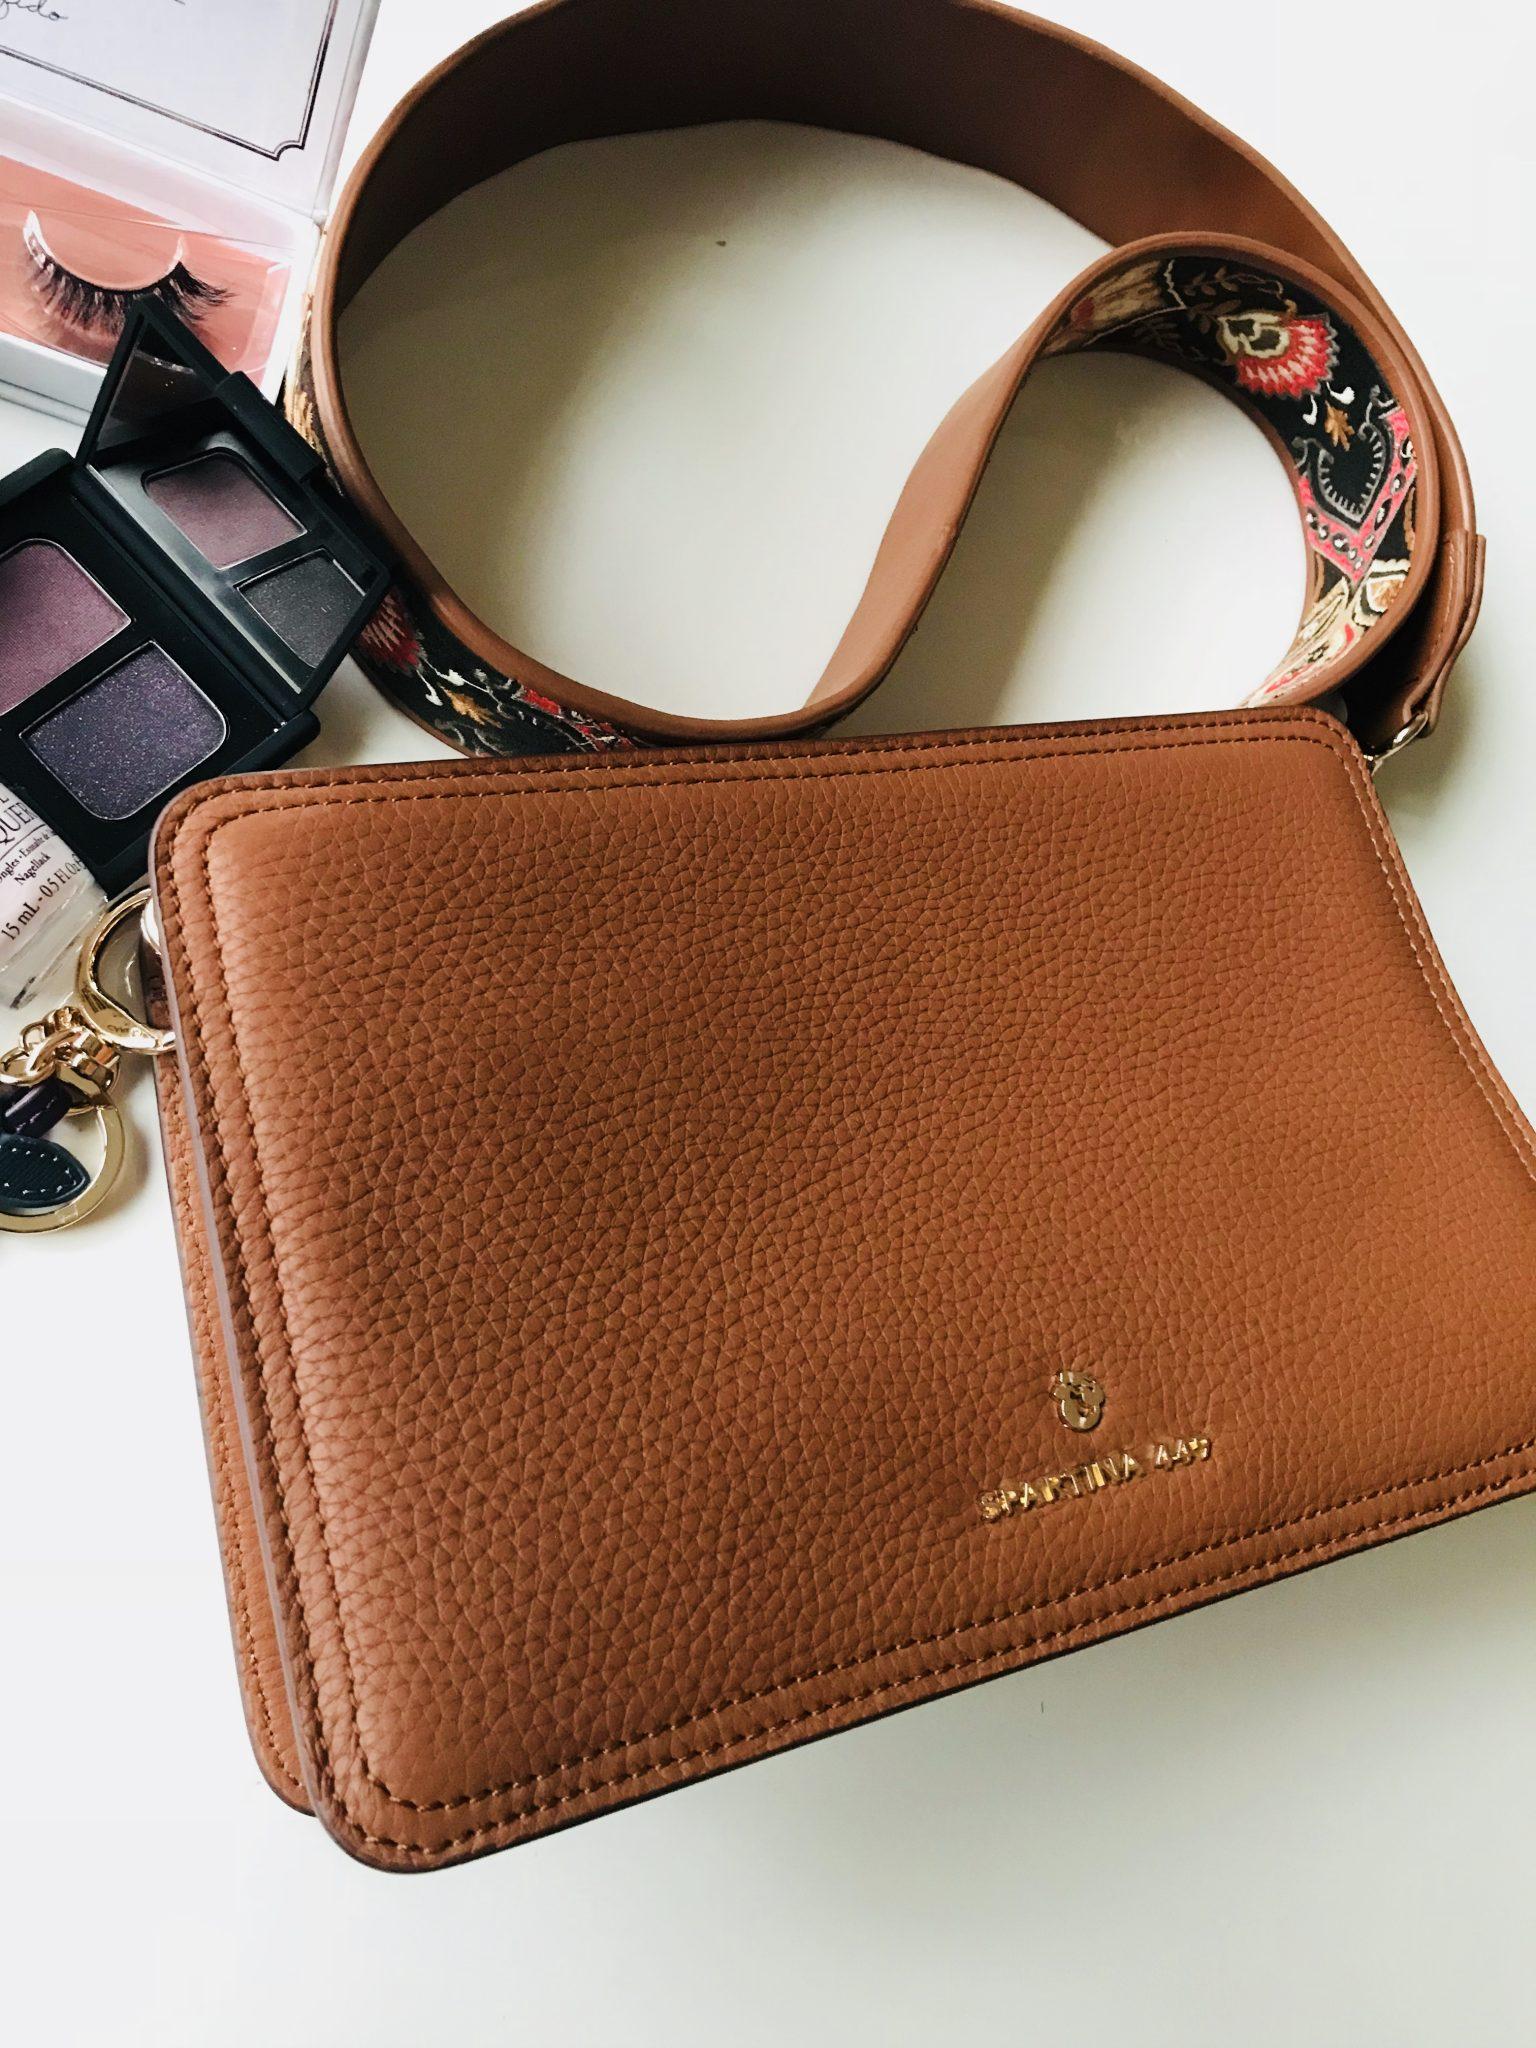 What's In My Bag: Spartina 449 Siren Box Shoulder Handbag